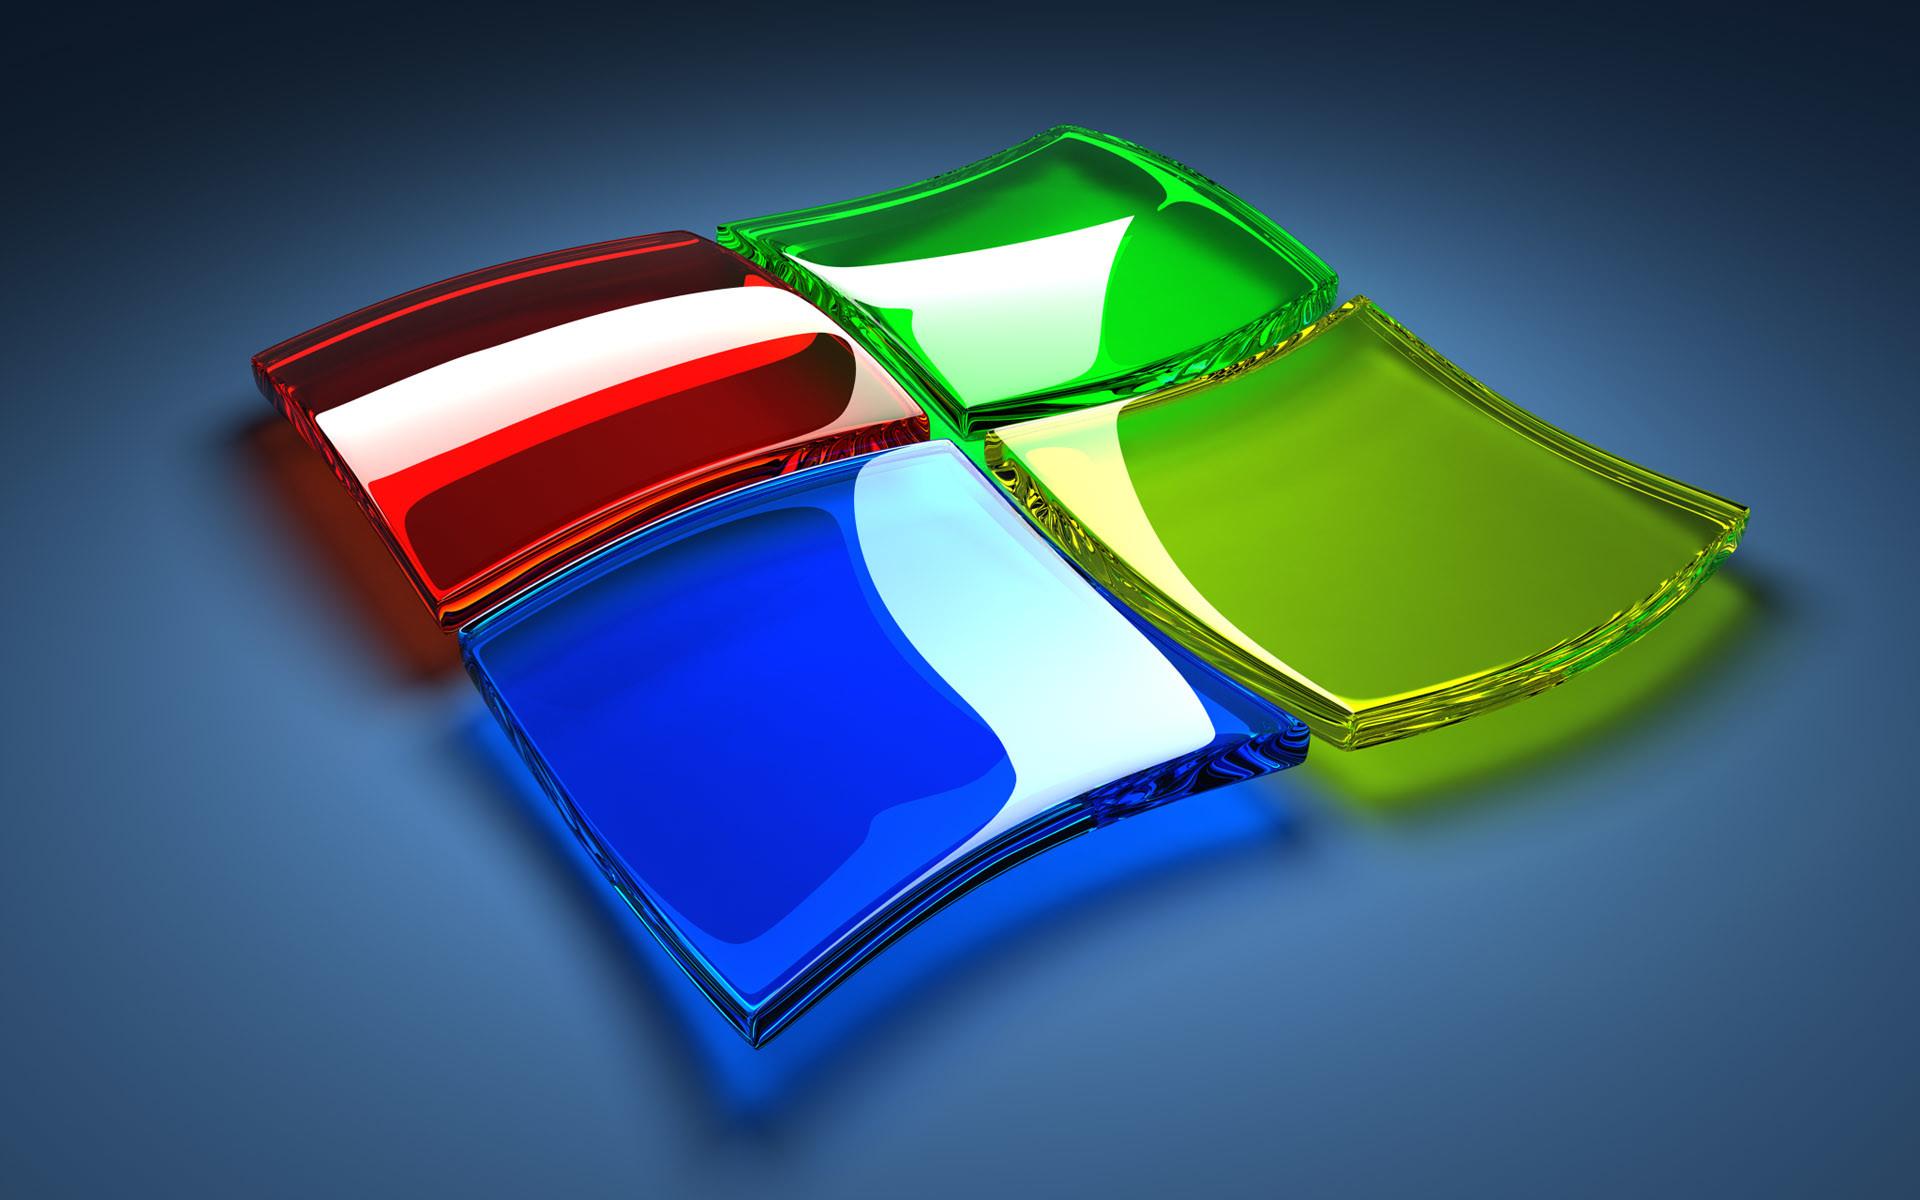 Gif Wallpaper Windows 7 58 Images